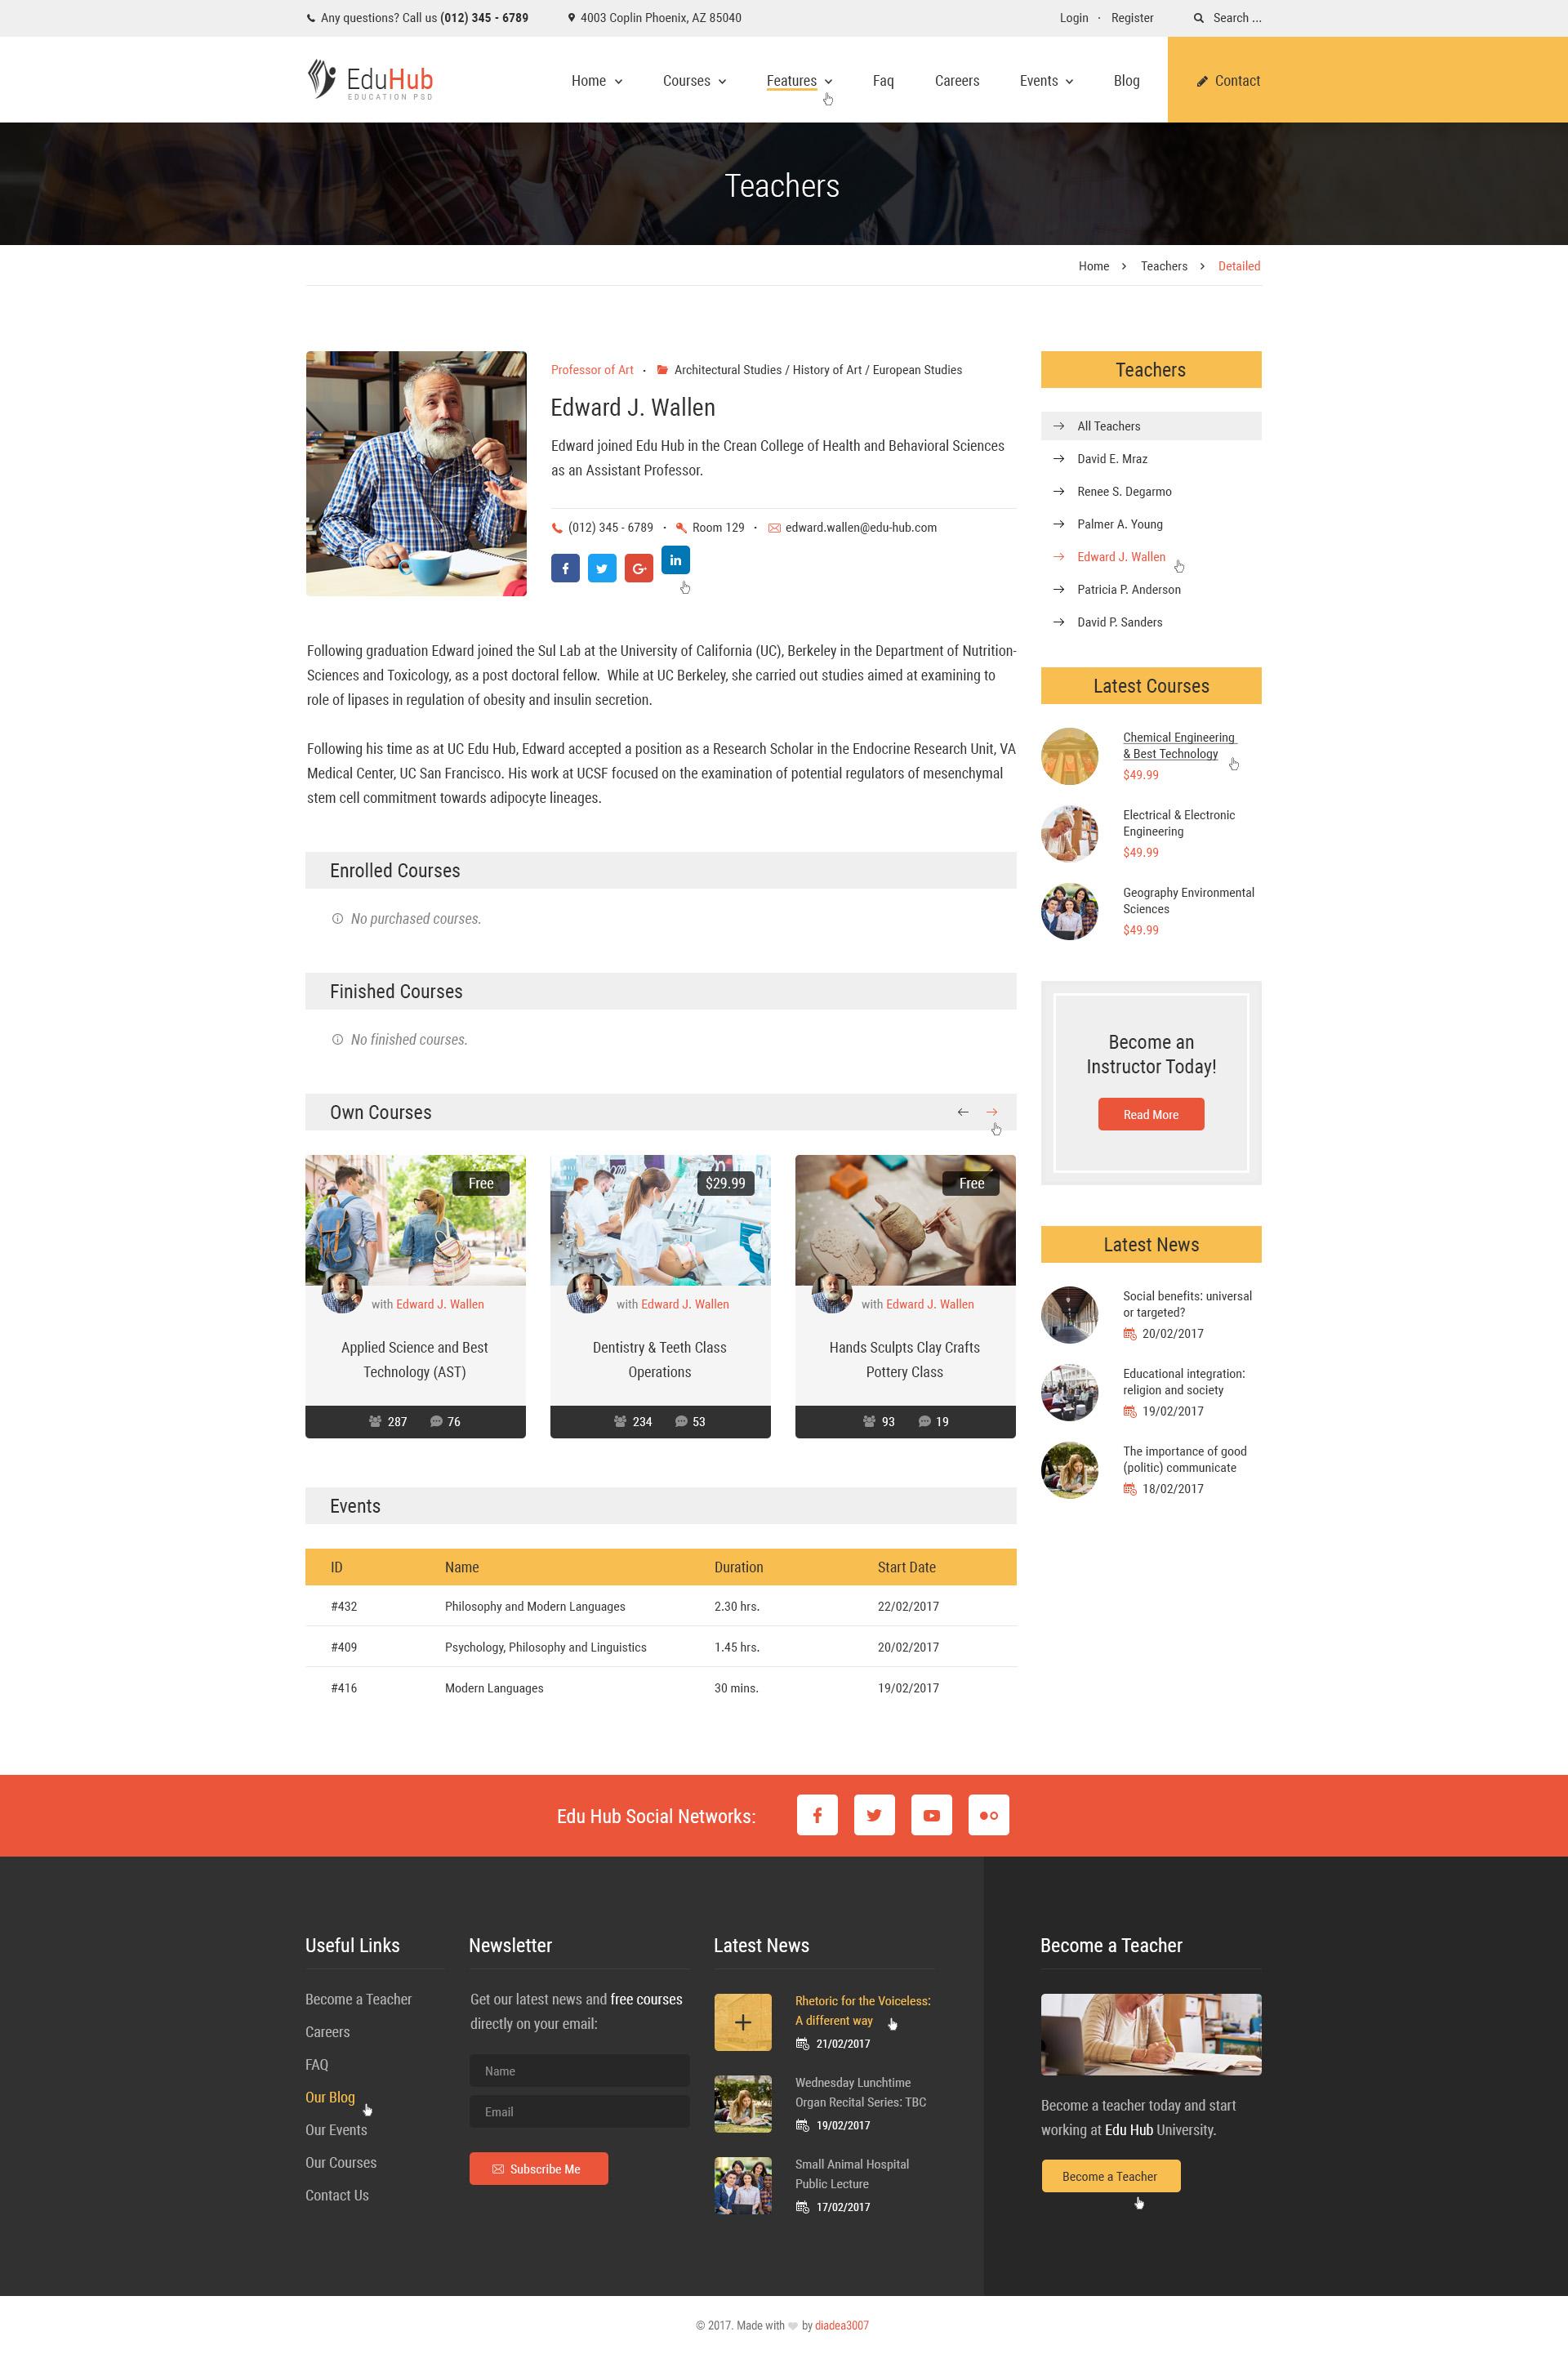 edu hub college education psd template by diadea themeforest 16 blog single post jpg 17 contact us jpg 18 course single detailed curriculum pop up jpg 19 login register pop up jpg 20 slider alternatives jpg